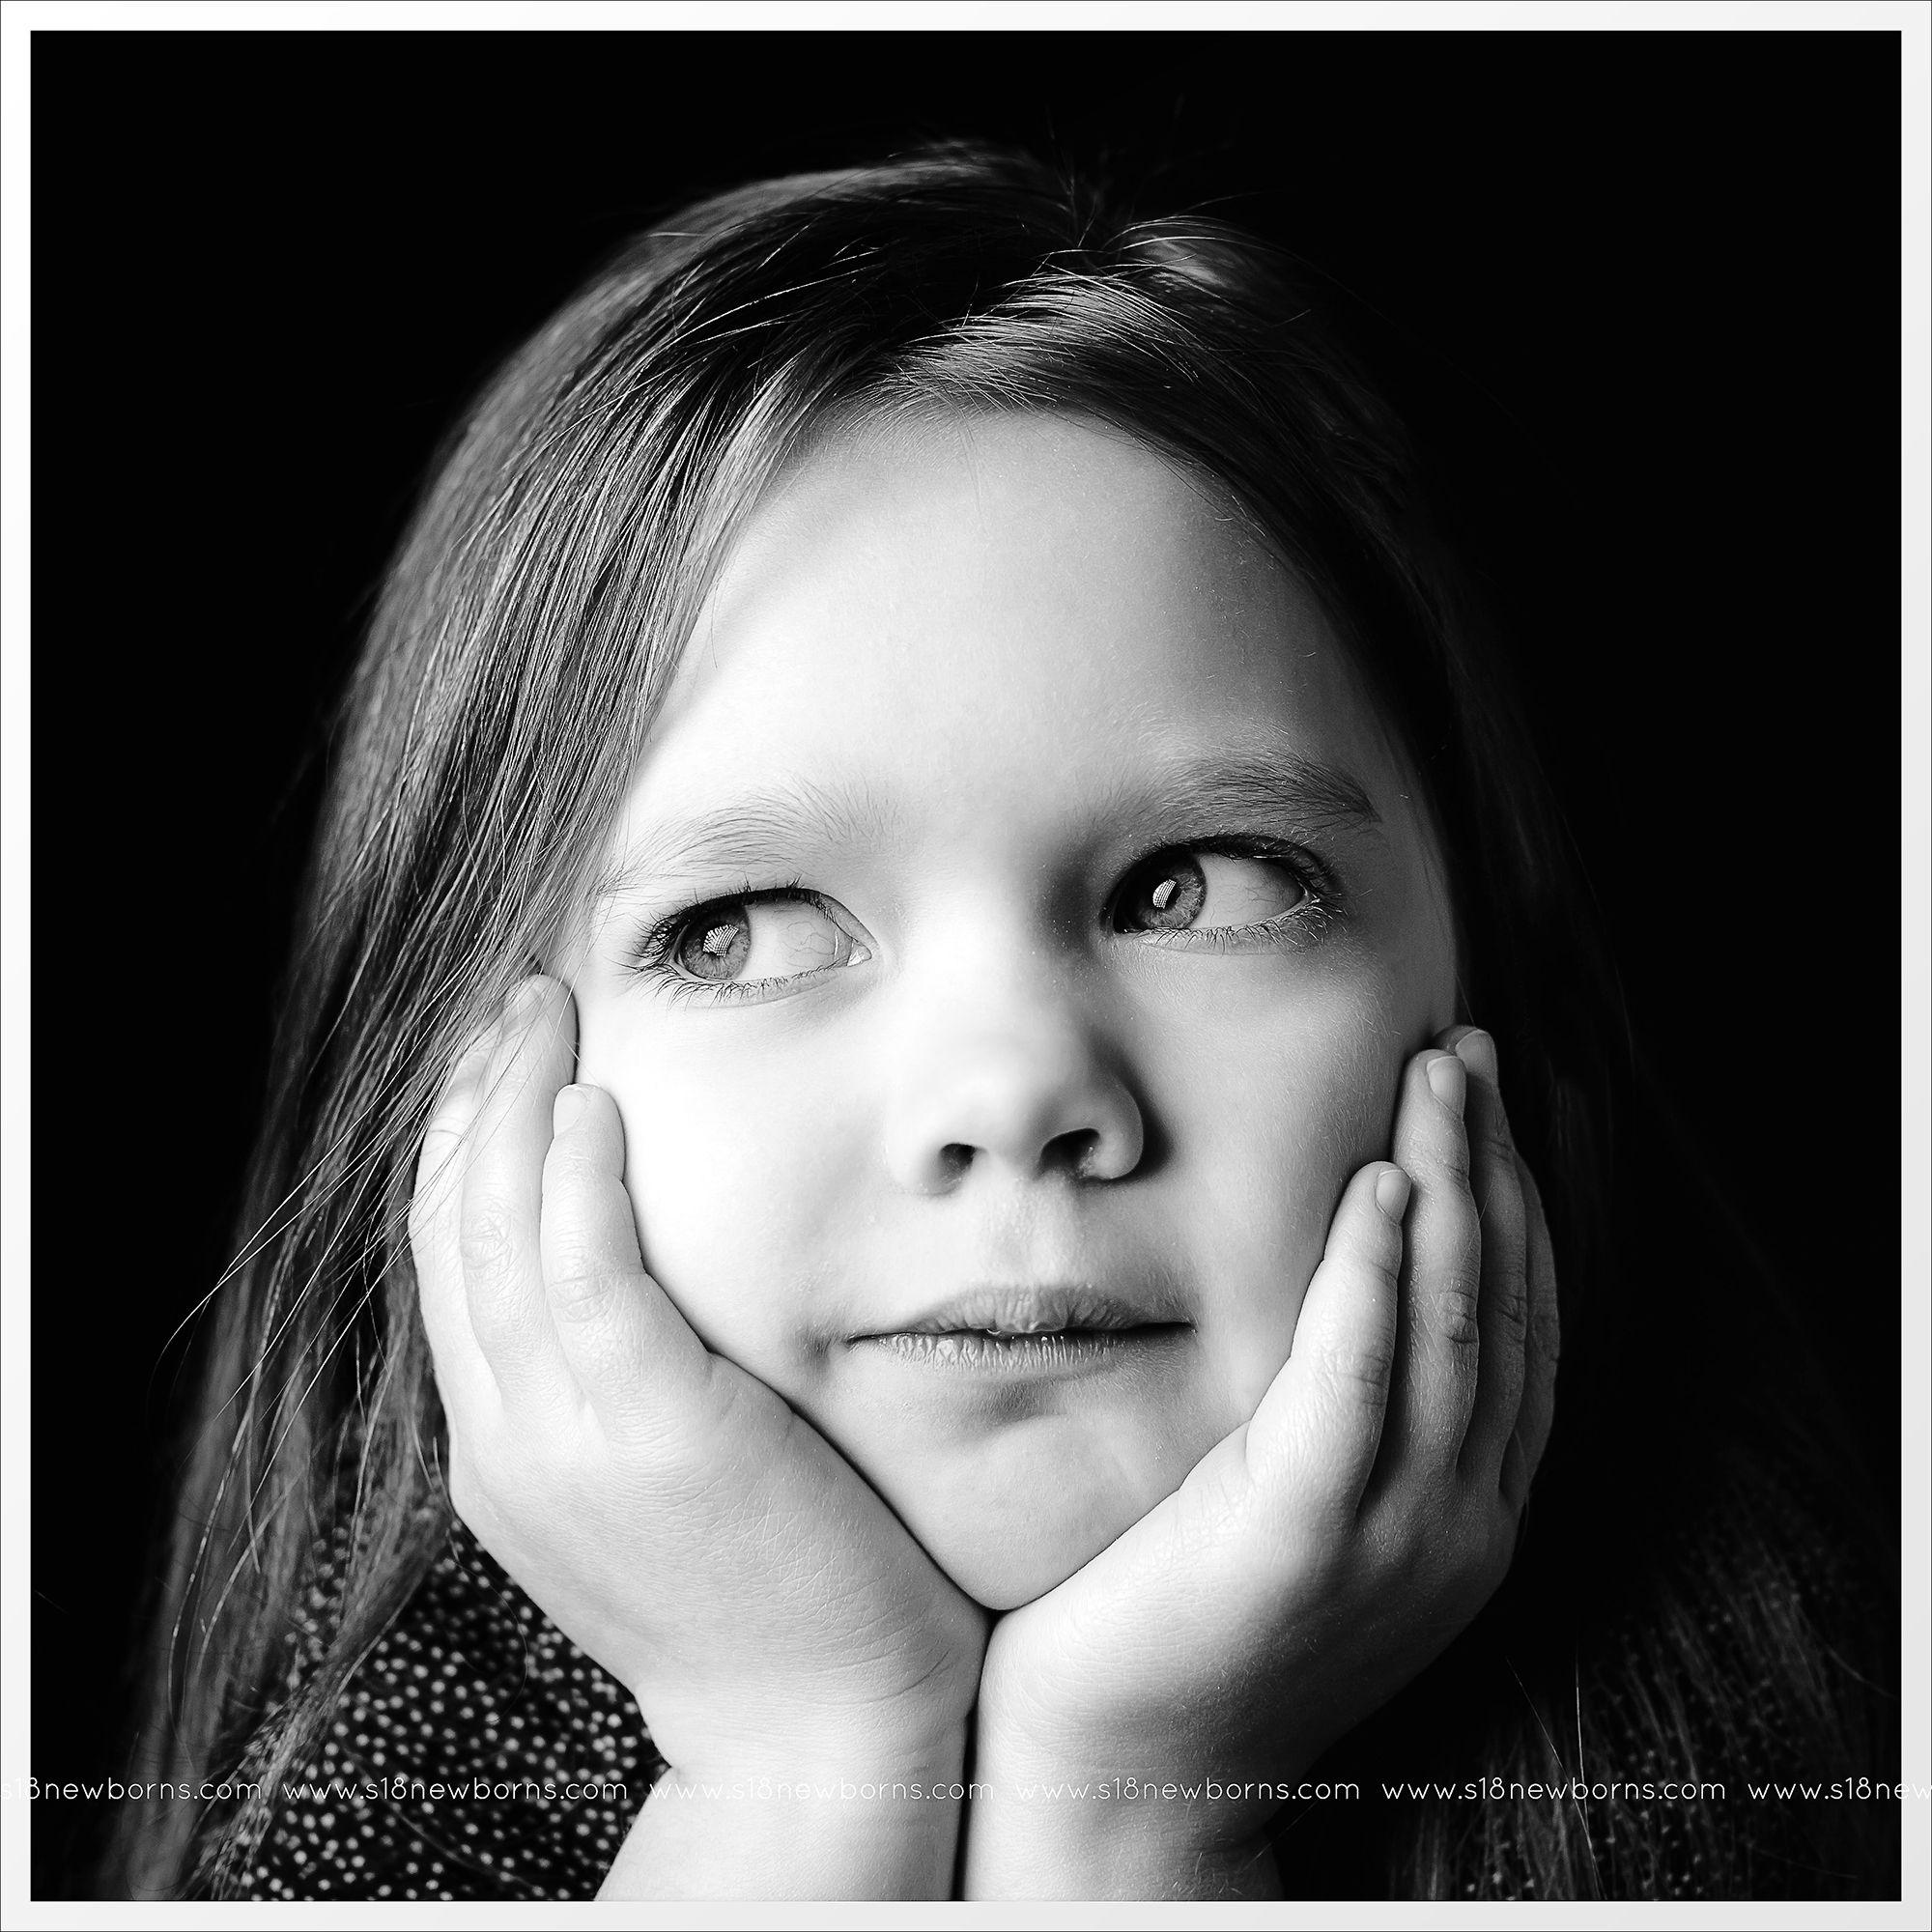 S18 Photography | New Jersey Children's Photographer www.s18newborns.com